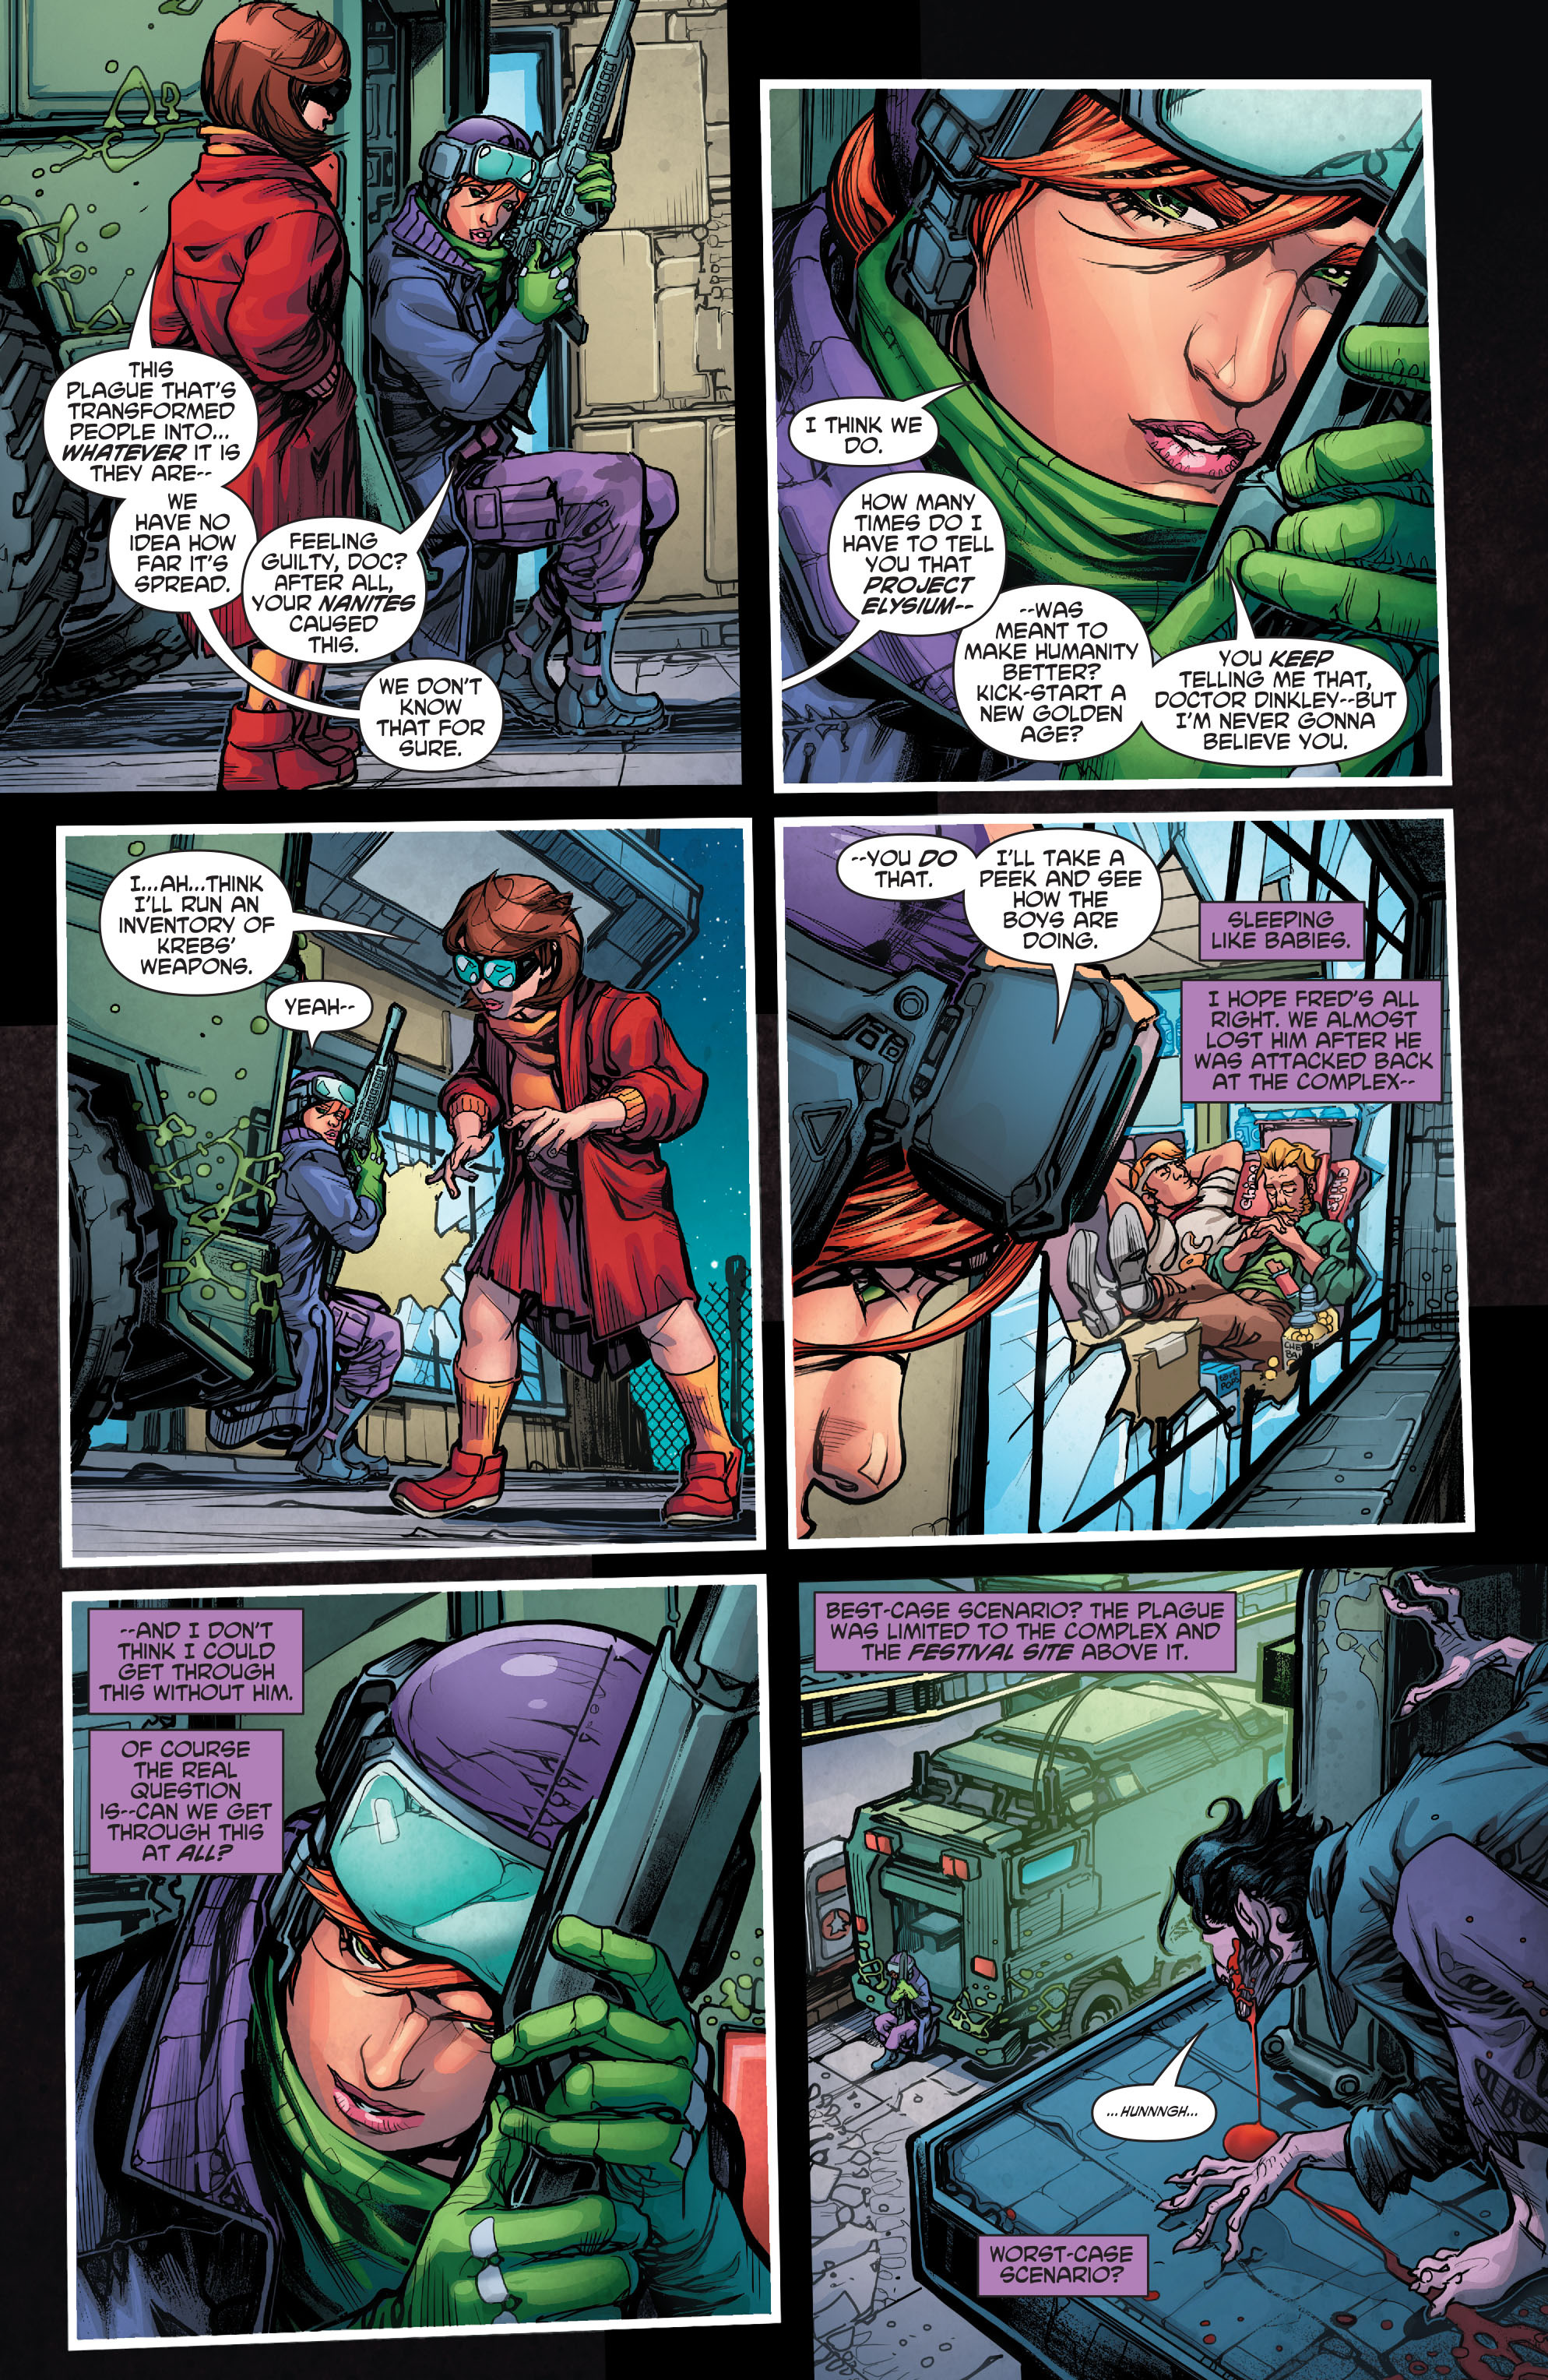 Read online Scooby Apocalypse comic -  Issue #4 - 7